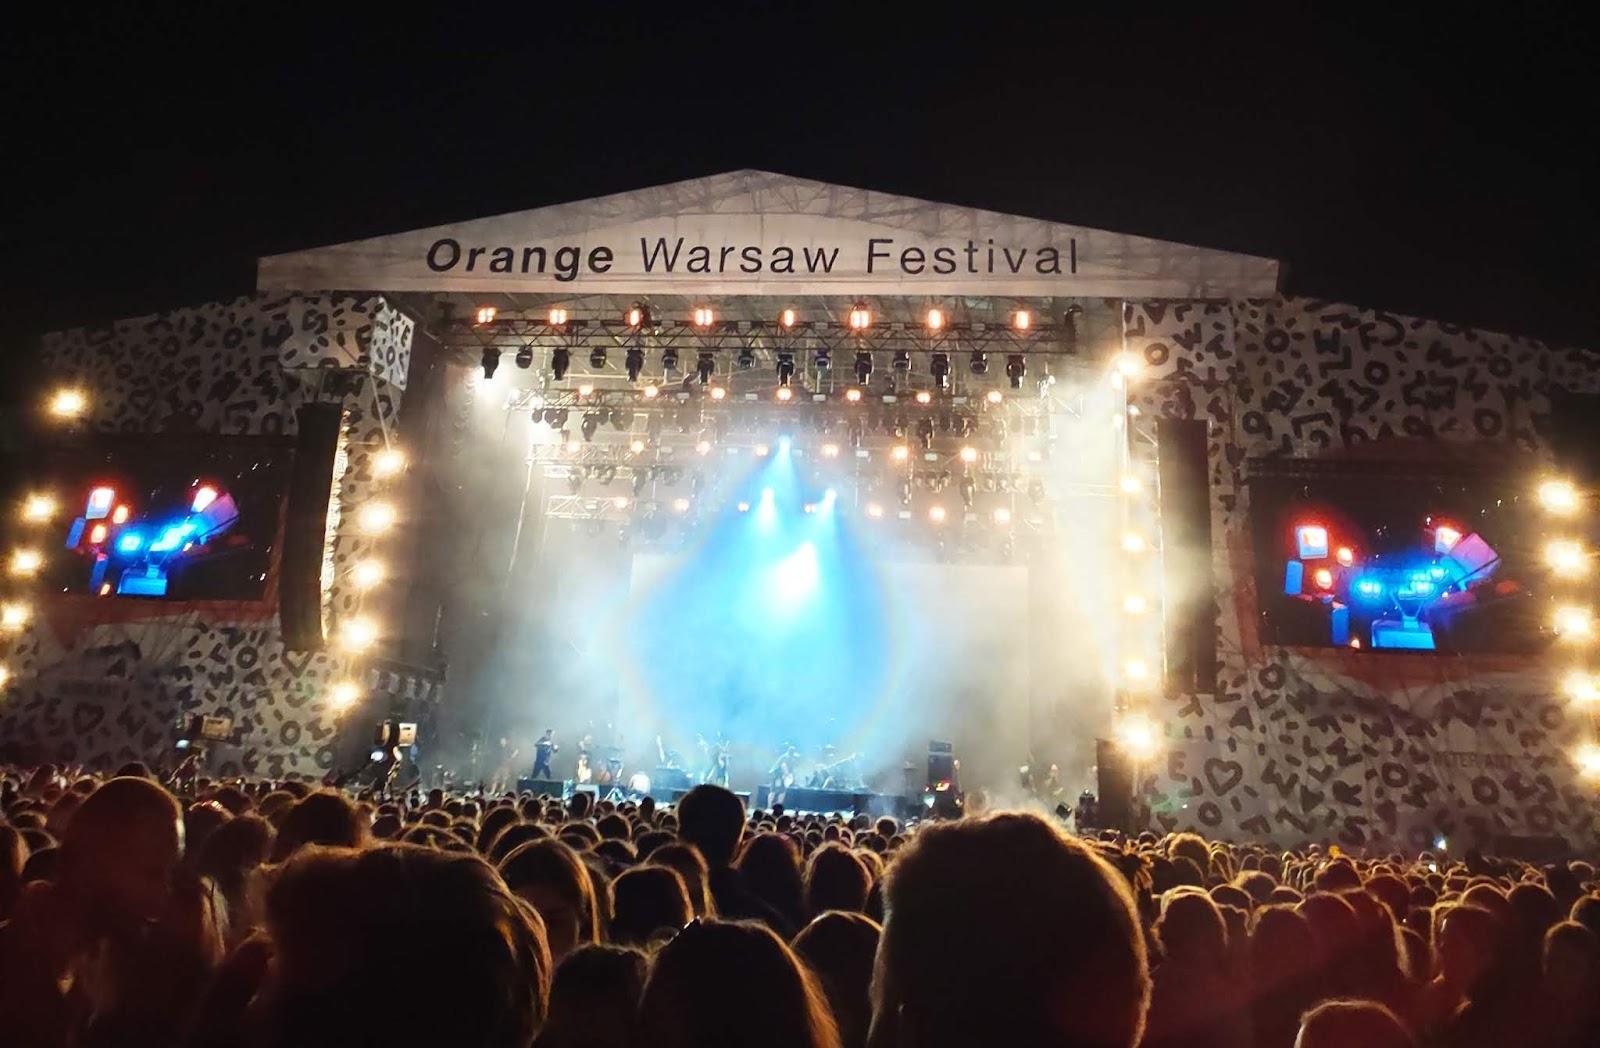 orange warsaw festival audience